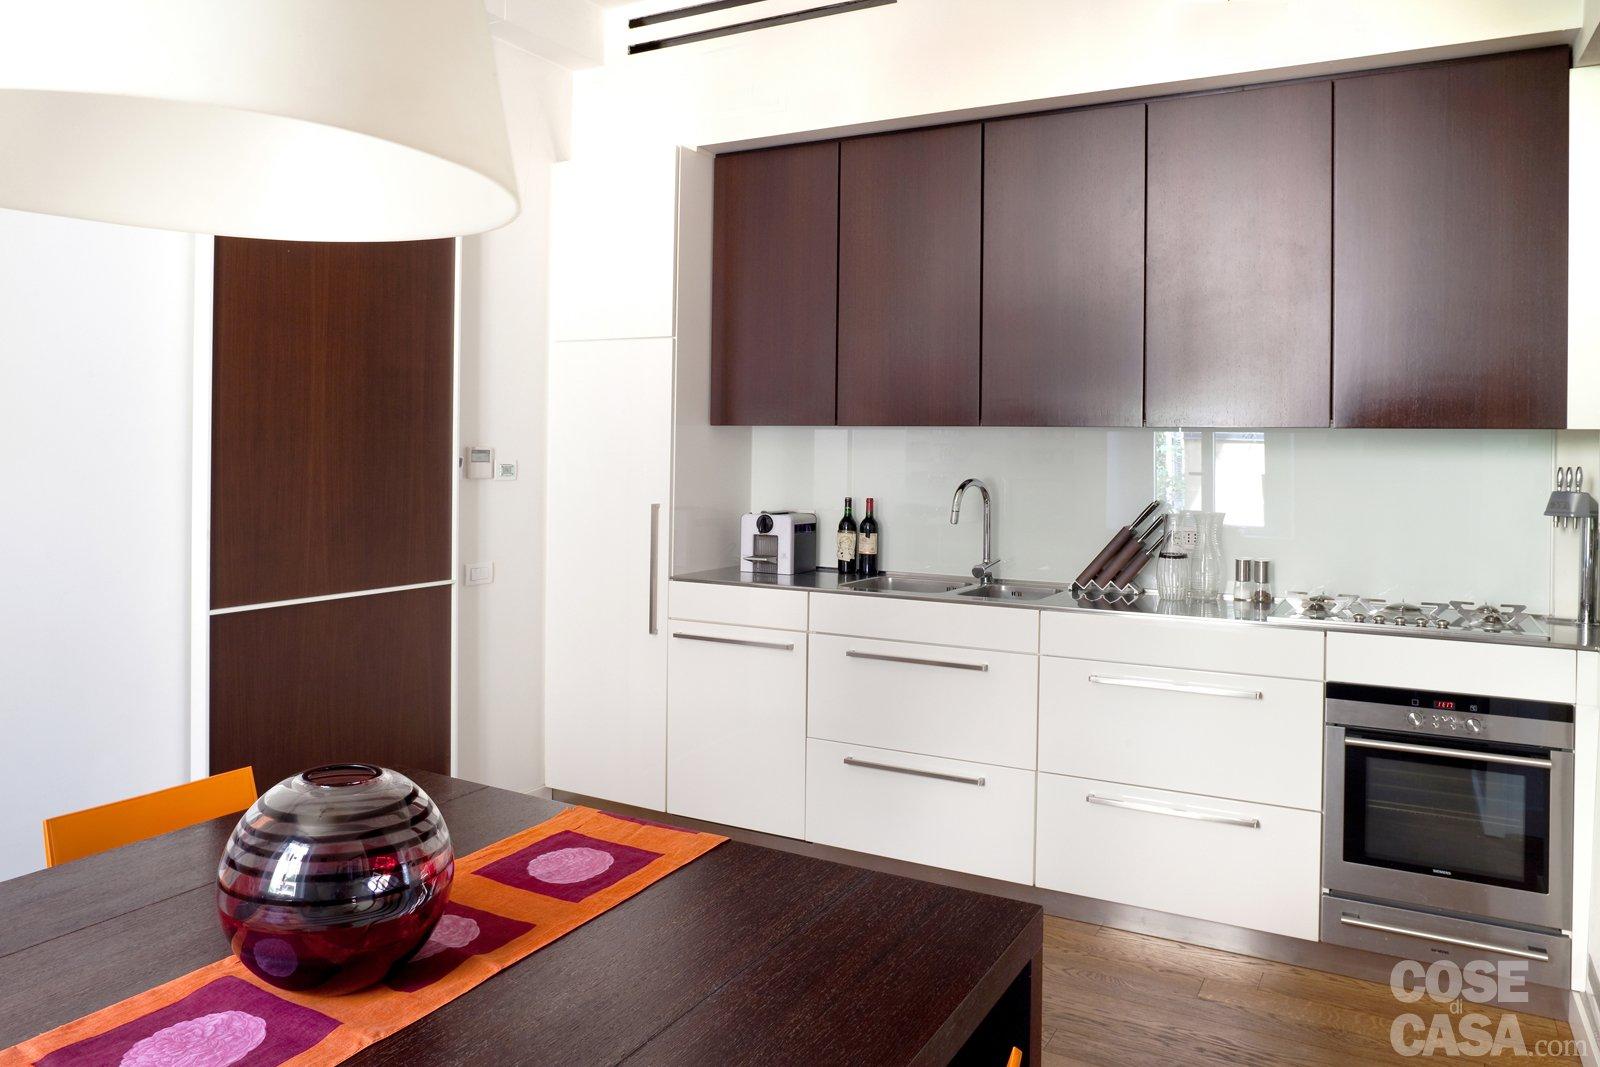 70 mq casa con veranda cose di casa - Cucina in casa ...